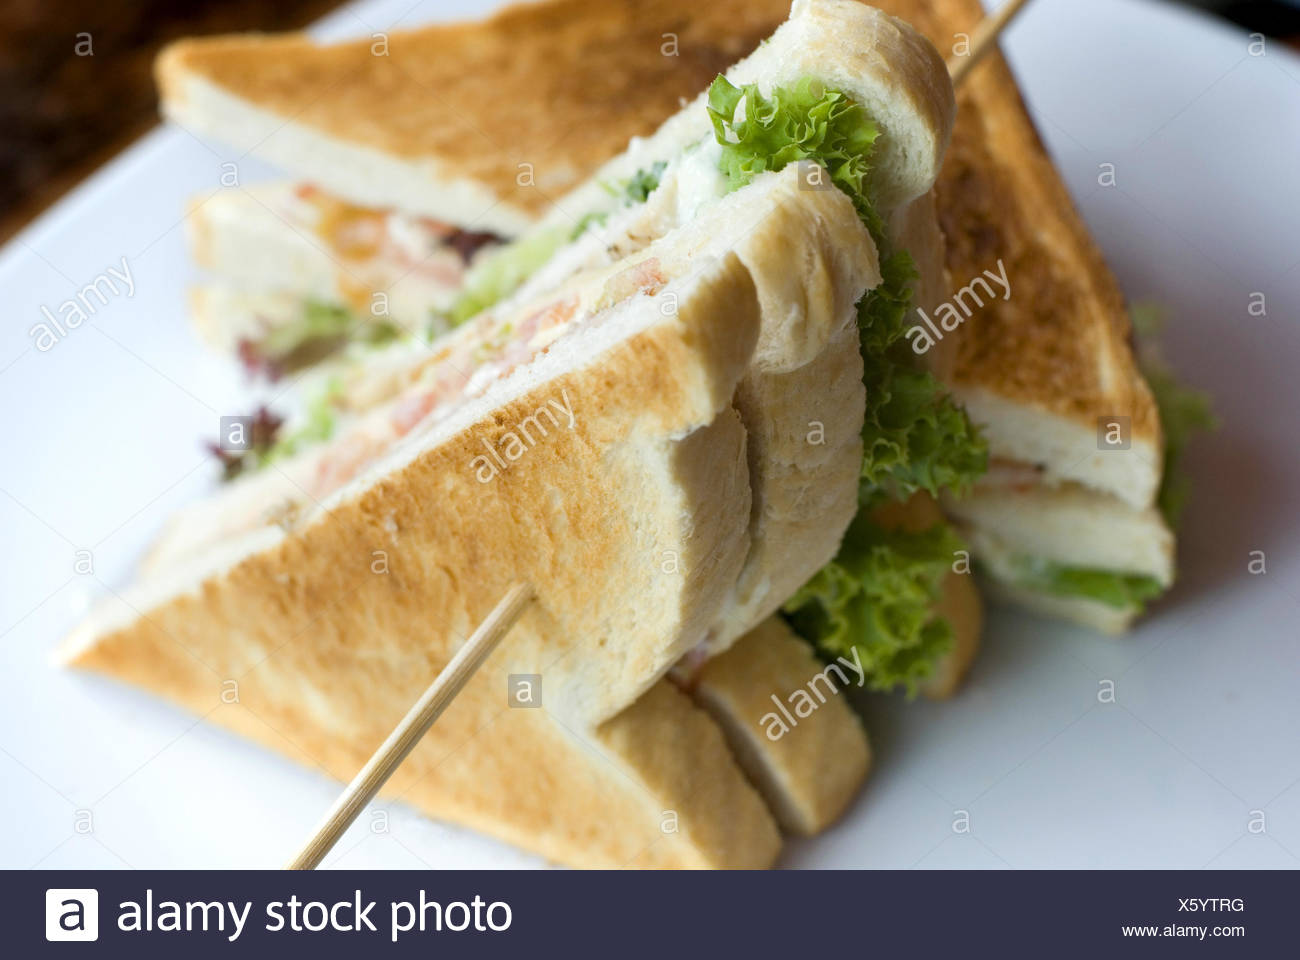 Club sandwich - Stock Image